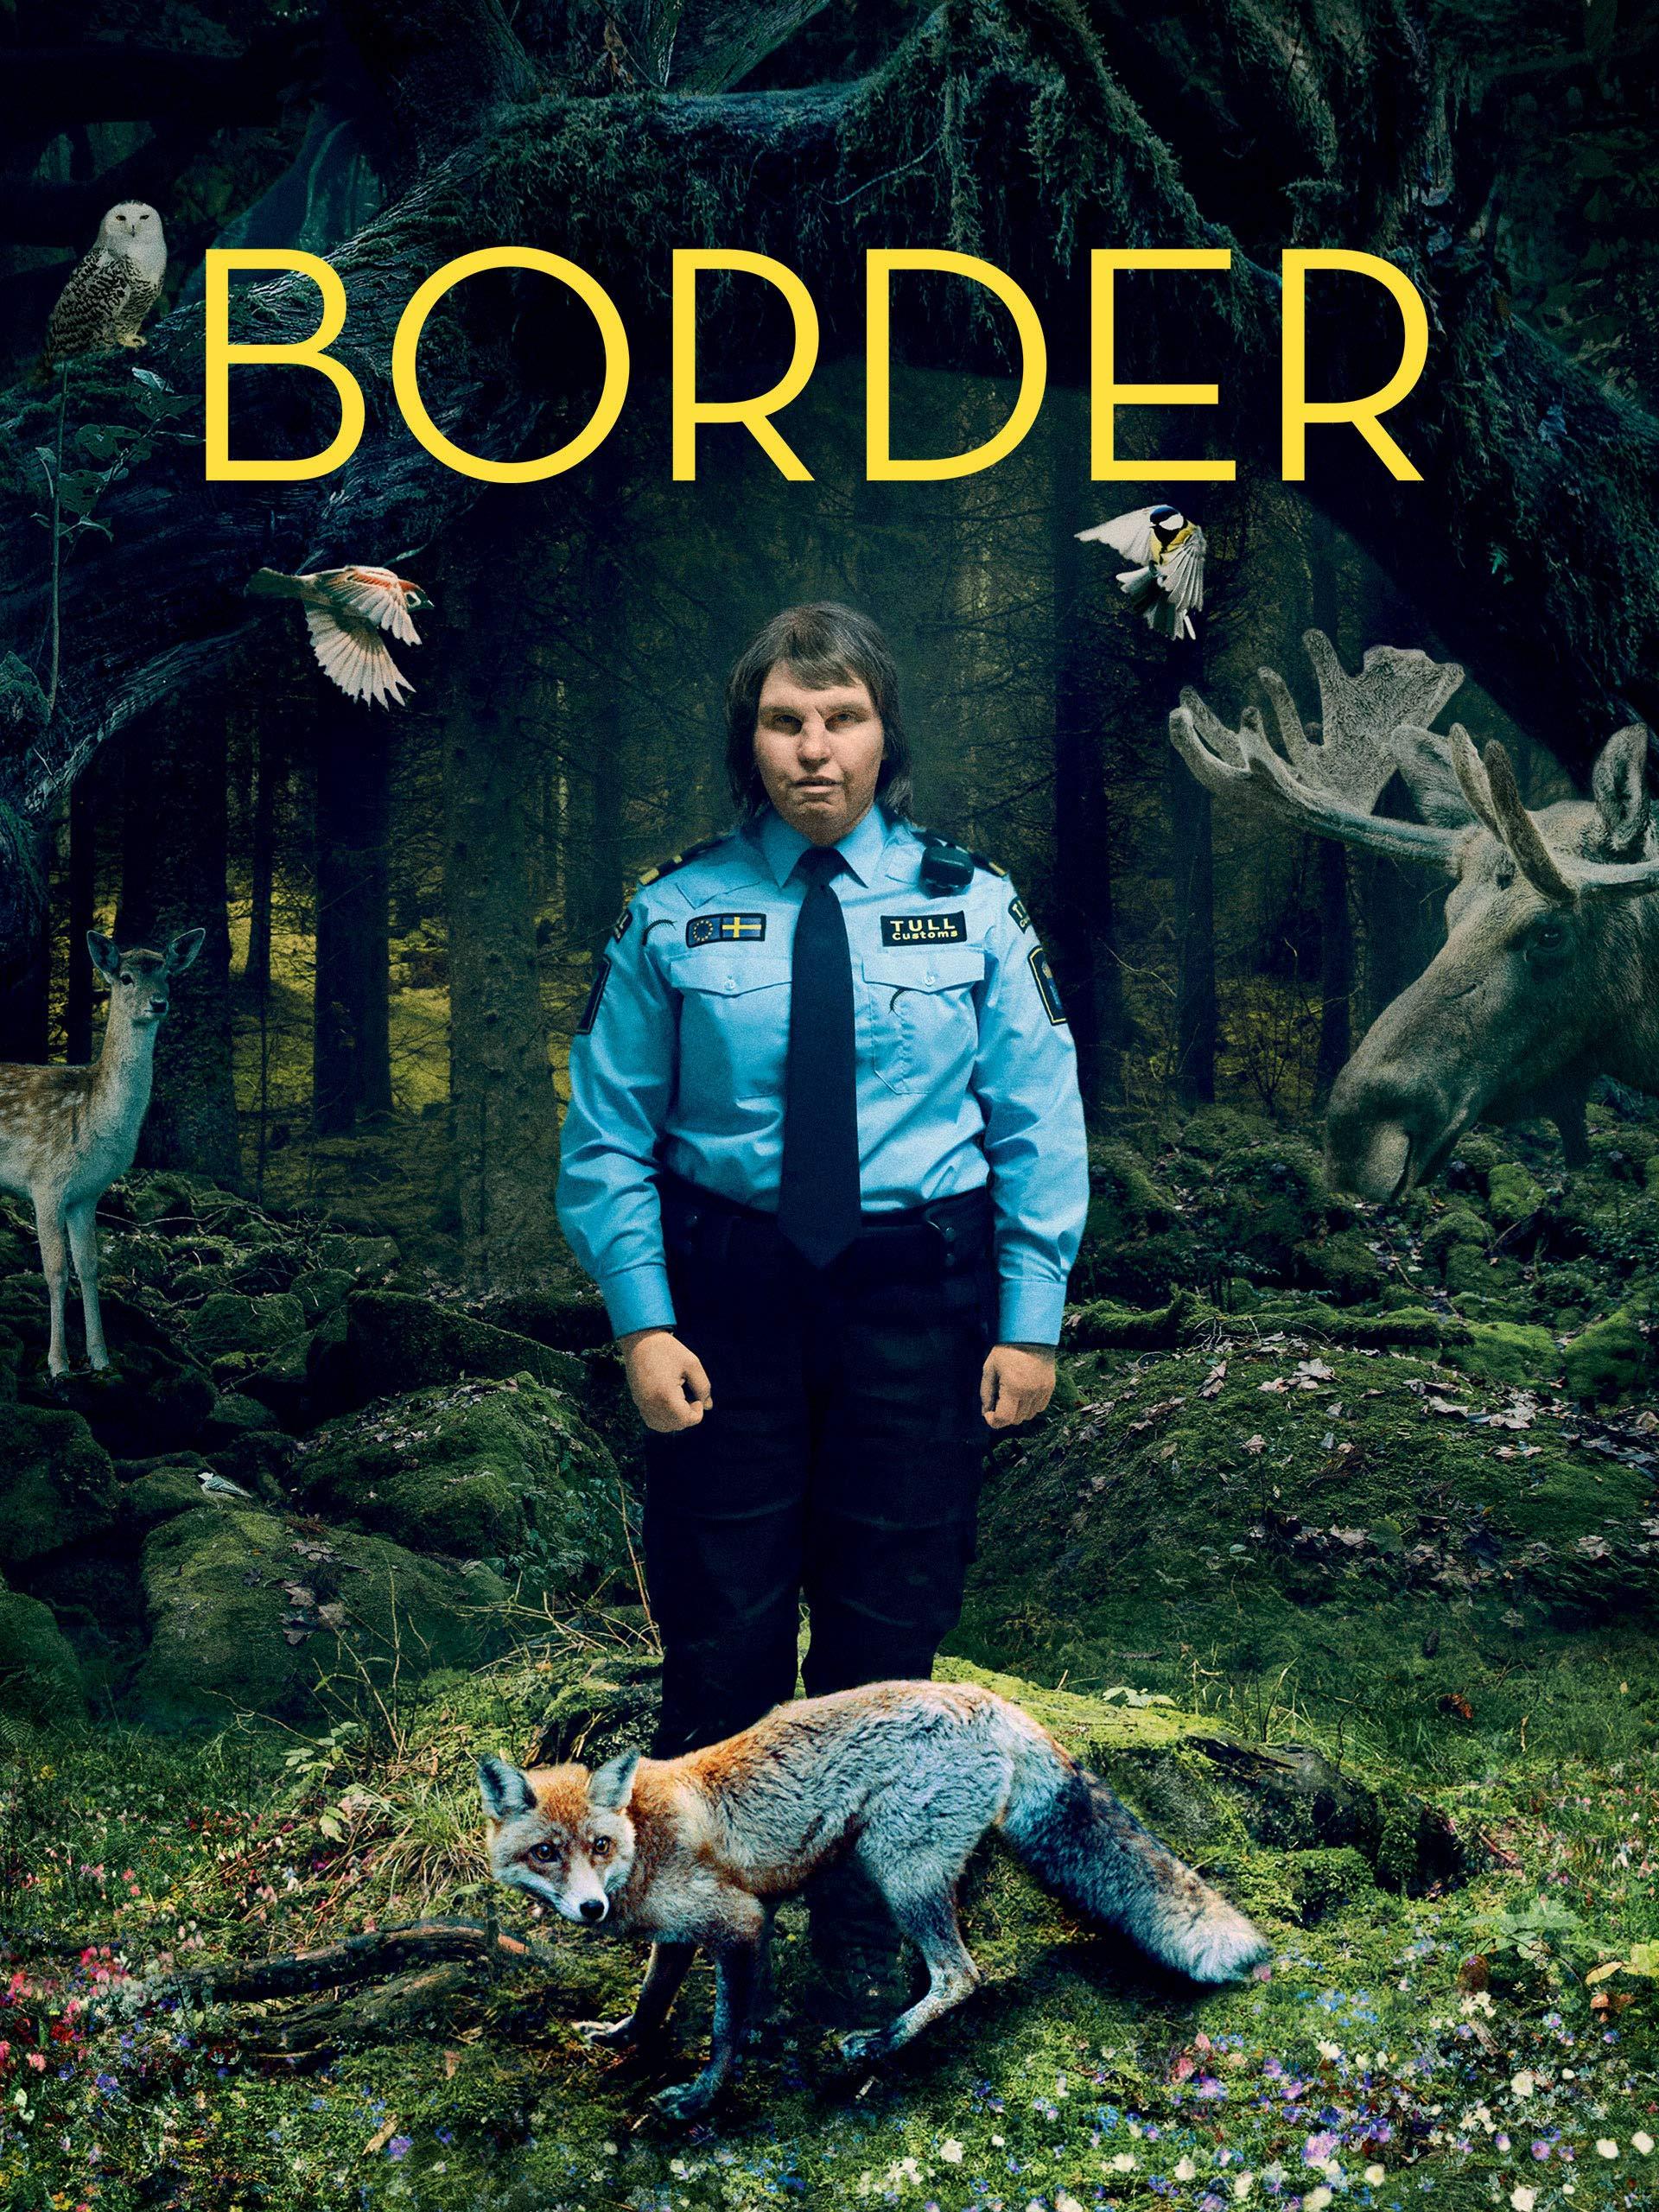 Image result for Border Swedish movie poster